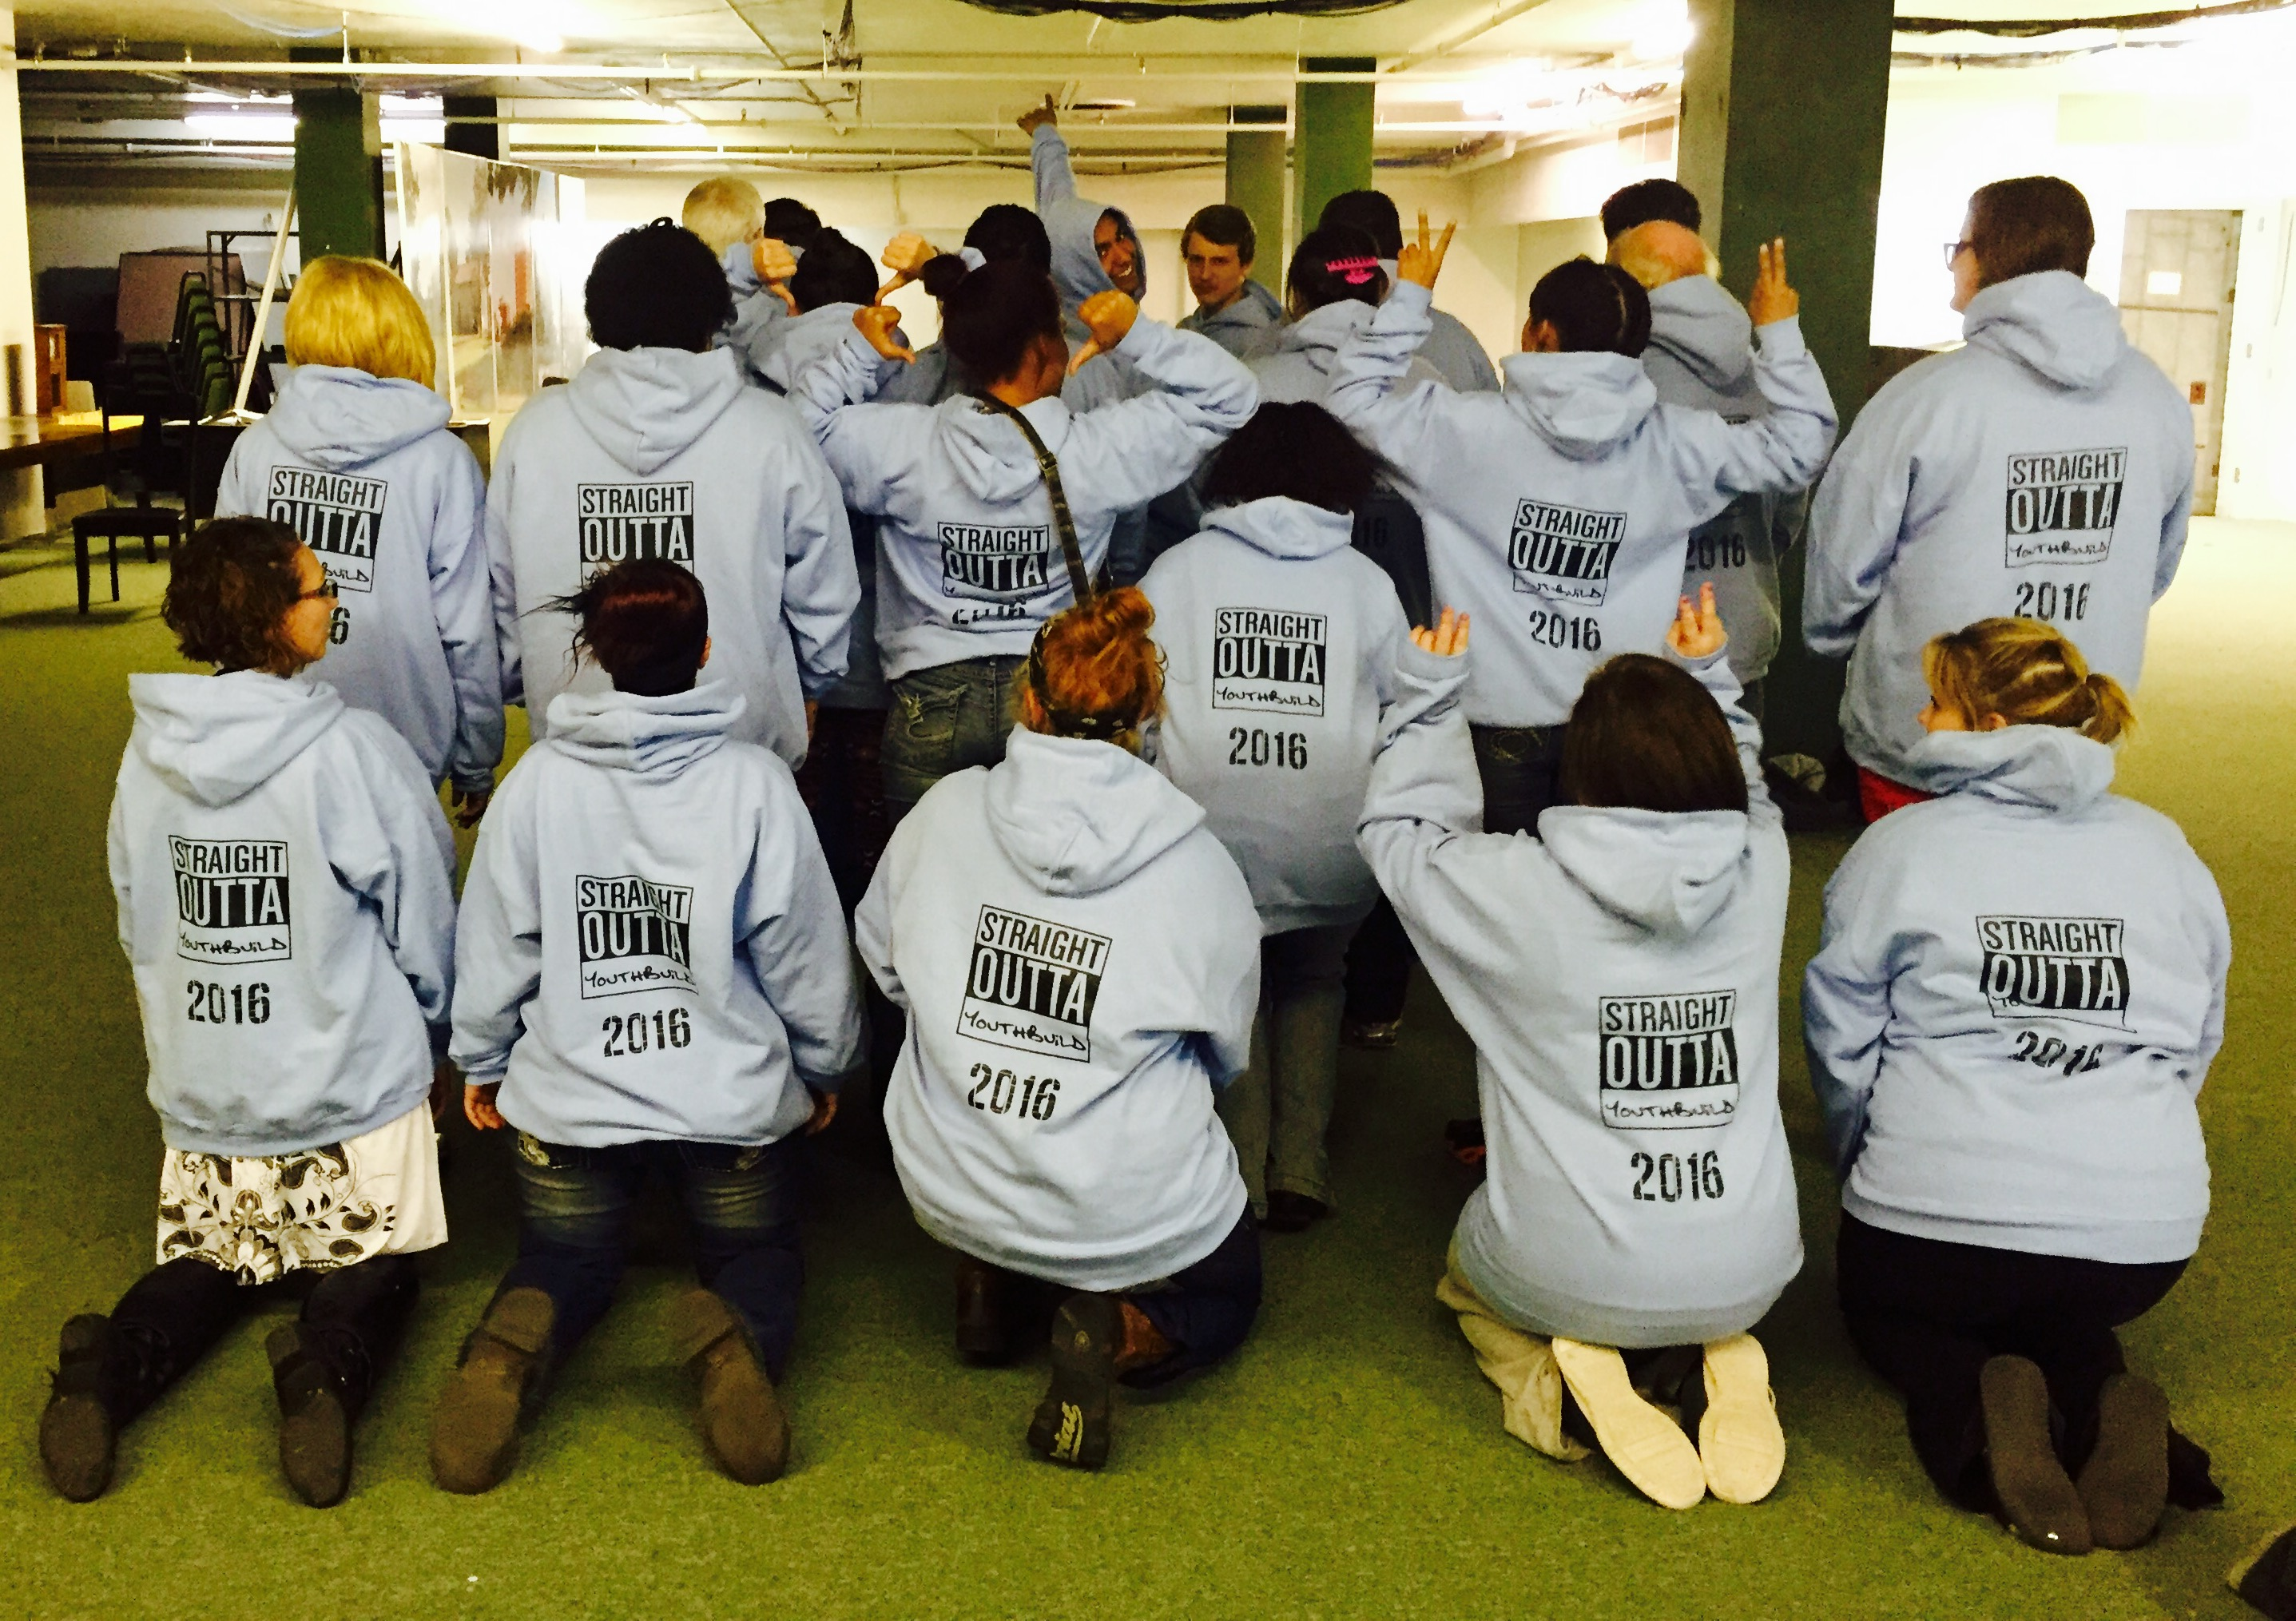 T shirt design youth - Cdsa Youth Build T Shirt Photo